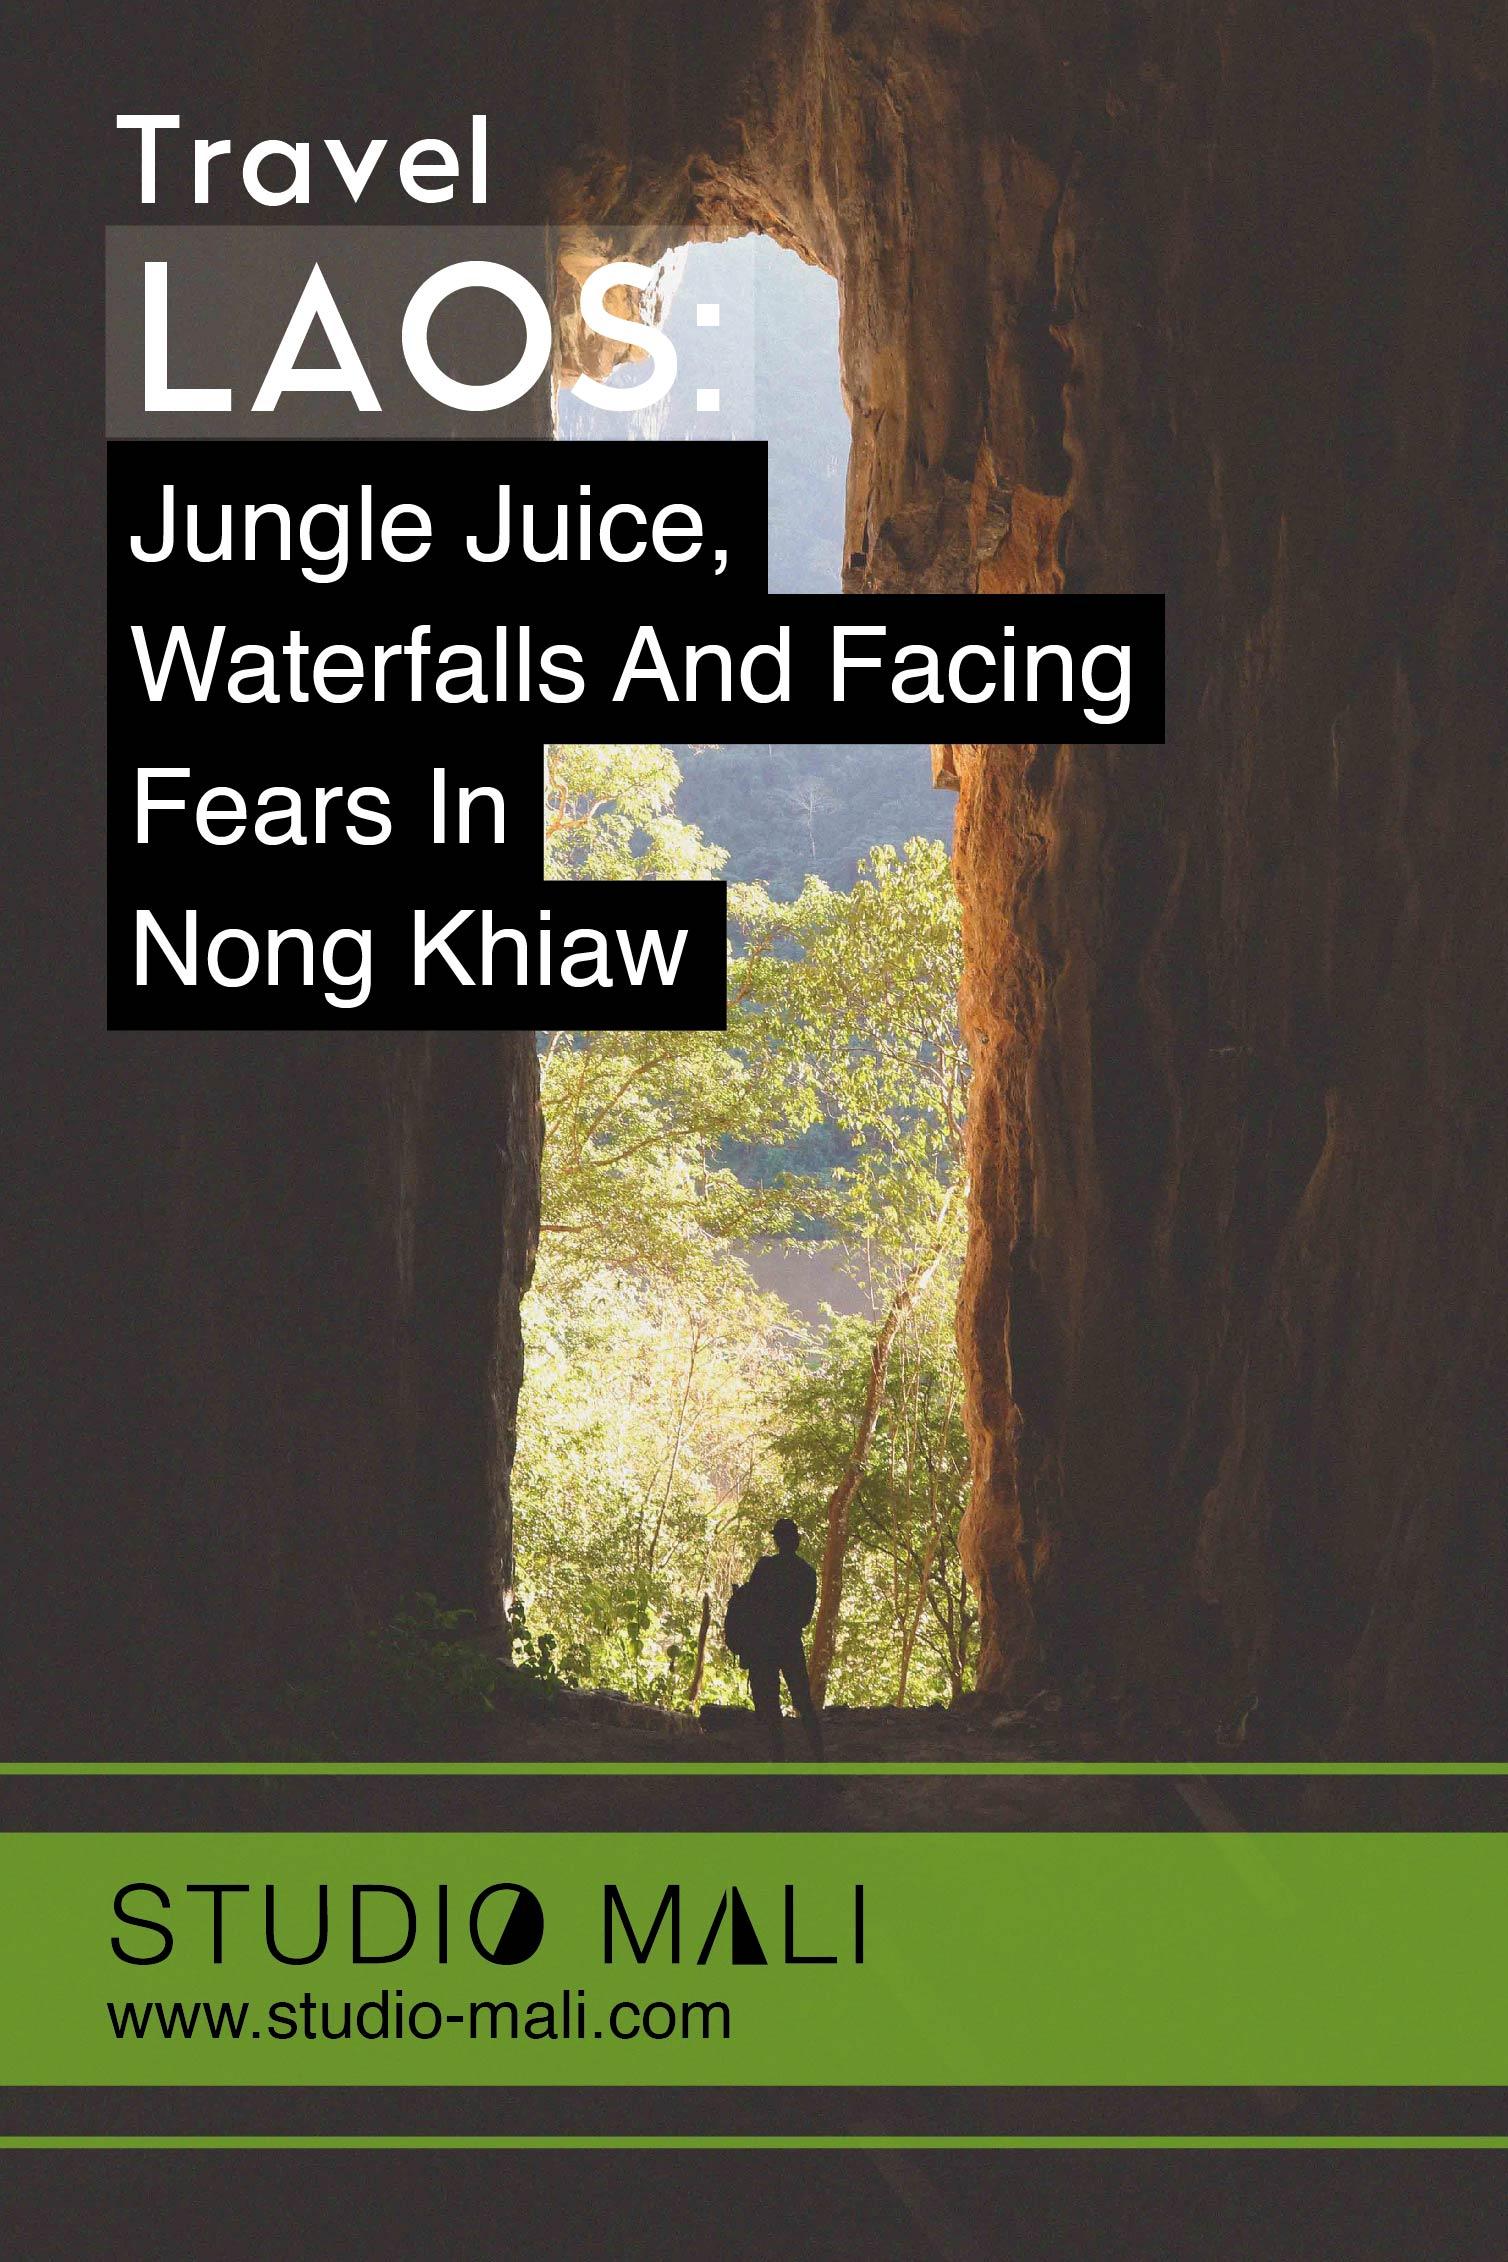 Laos - Jungle Juice, Waterfalls And Facing Fears In Nong Khiaw, By Studio Mali-10.jpg